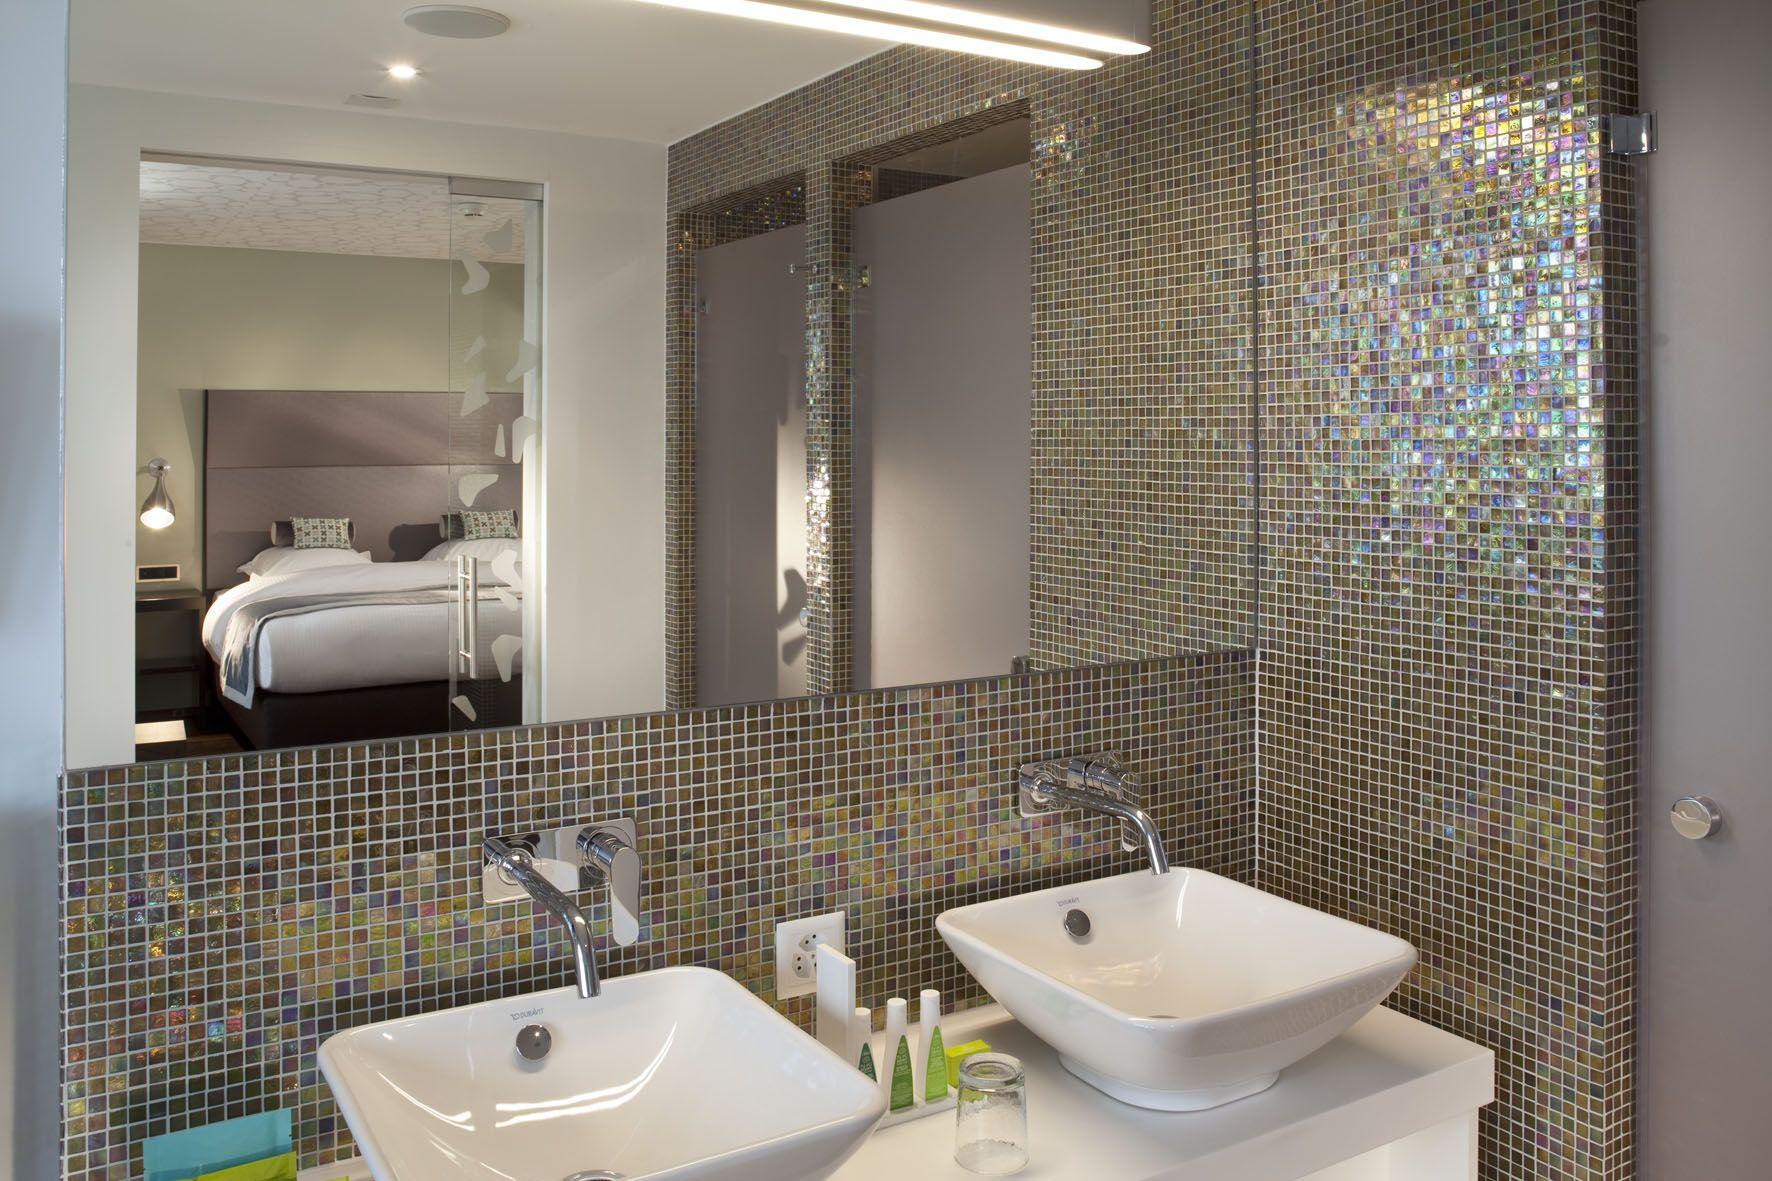 Salle De Bain Luxe Hotel ~ in room amenities hotel d basel pinterest